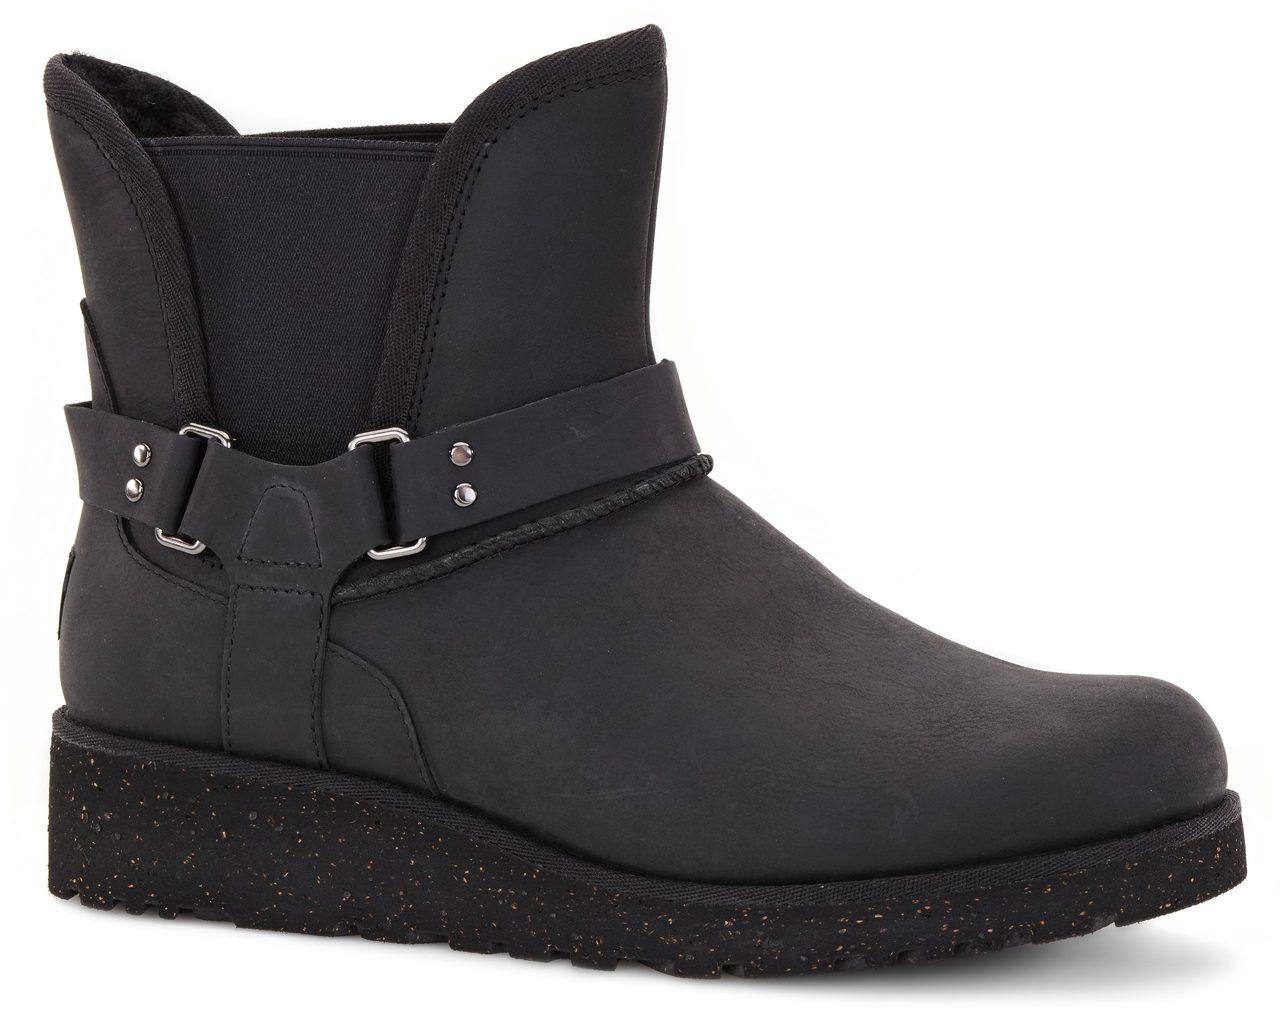 ... Boots; UGG Australia Women's Glen. Black